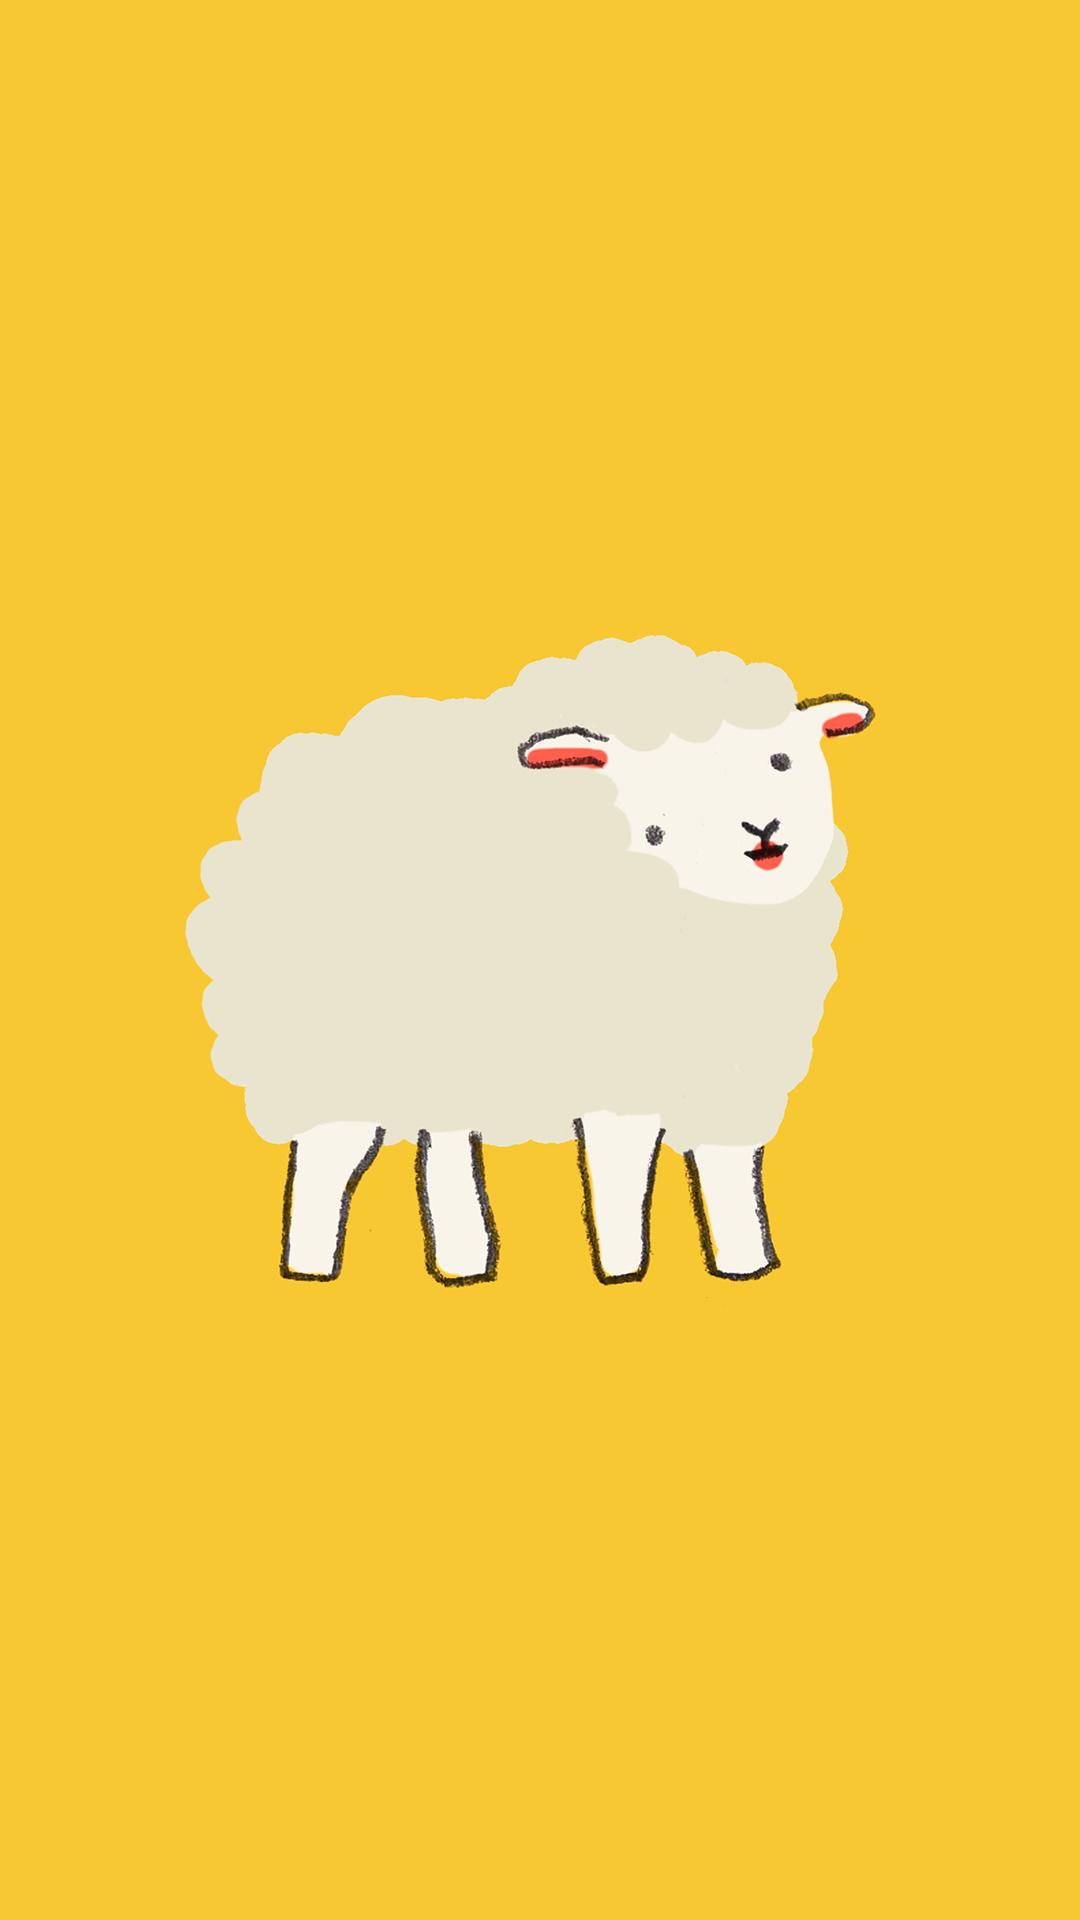 White Sheep Wallpaper